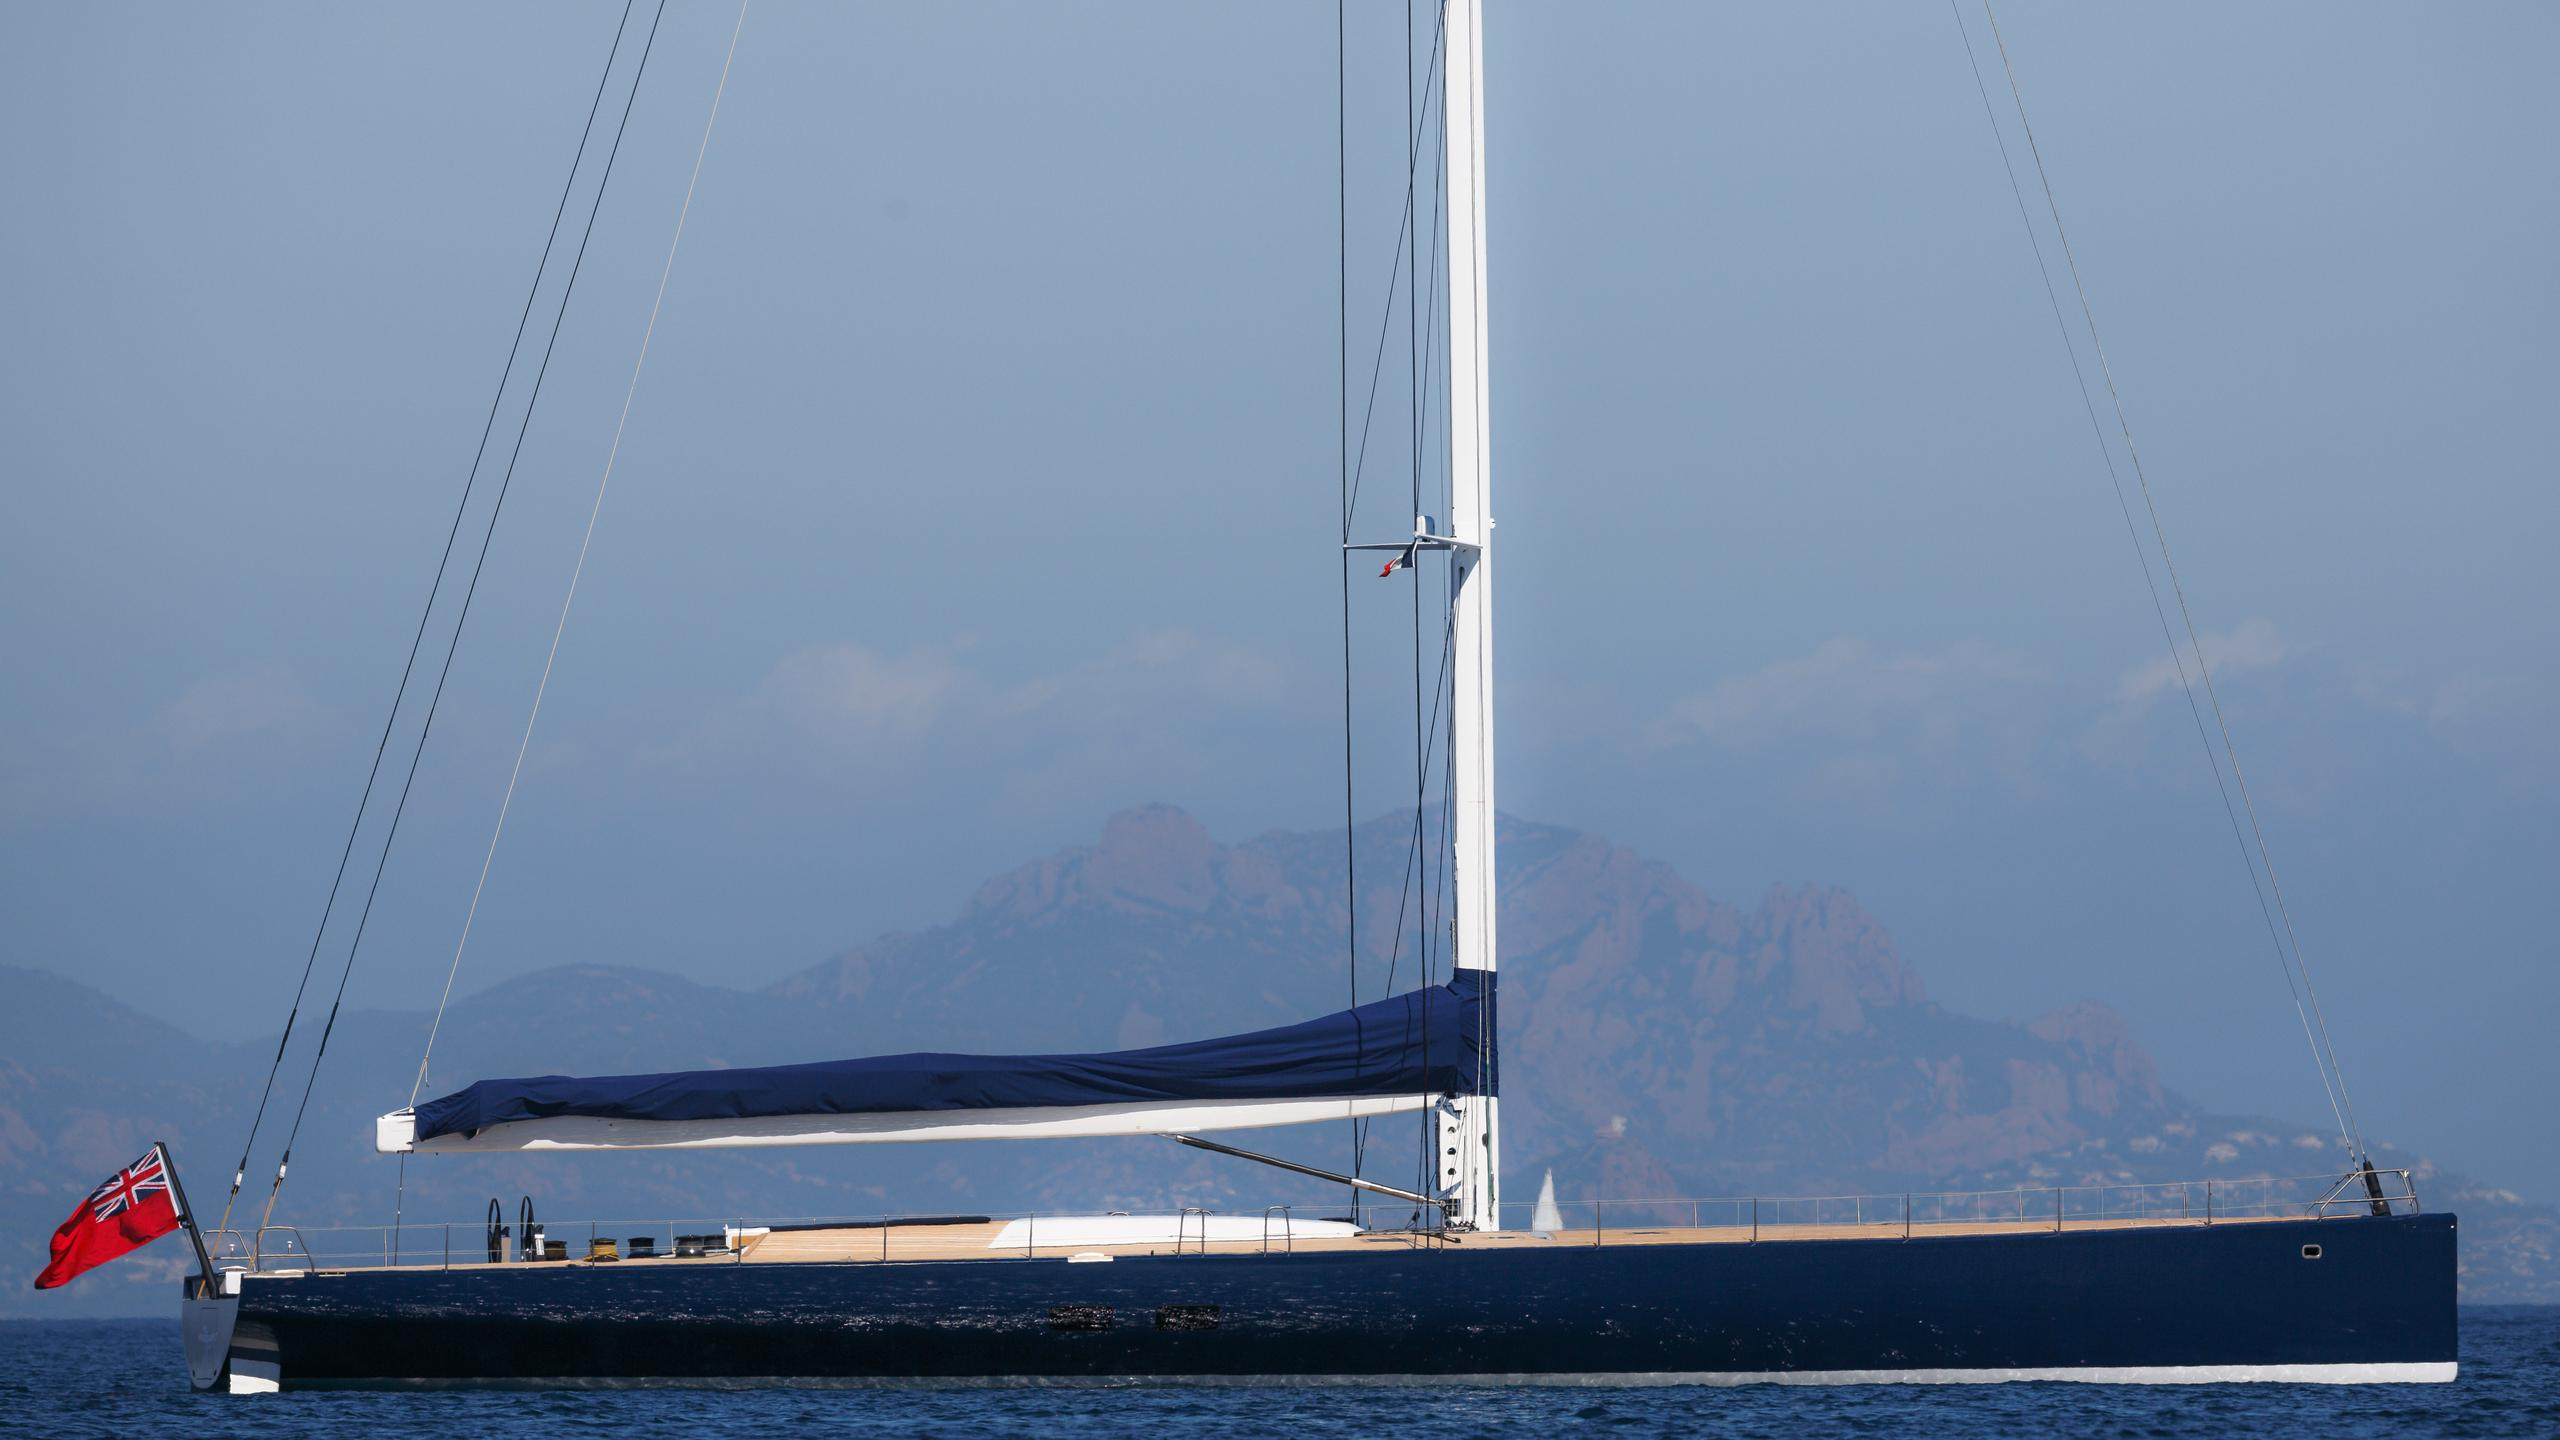 Magic-Carpet-iii-sailing-yacht-wally-21013-30m-moored-profile